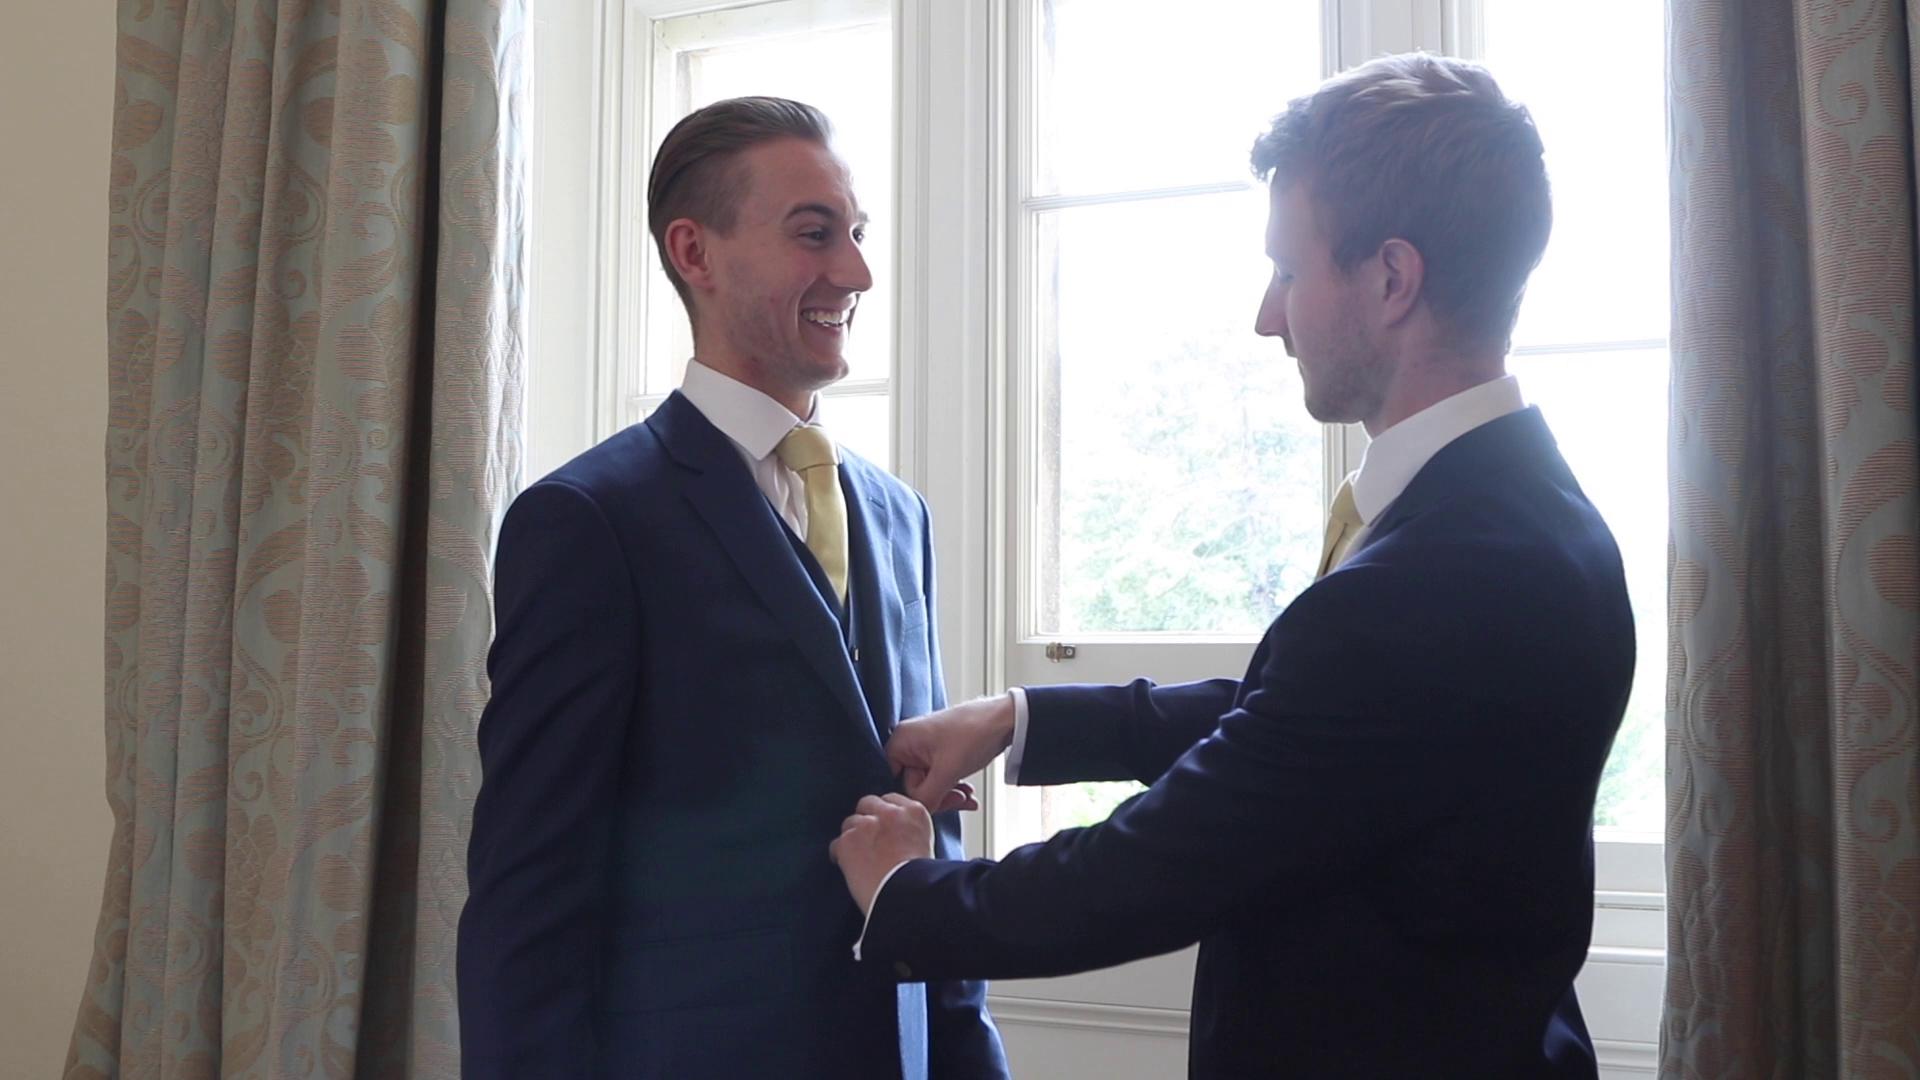 Nottingham Wedding Videographer